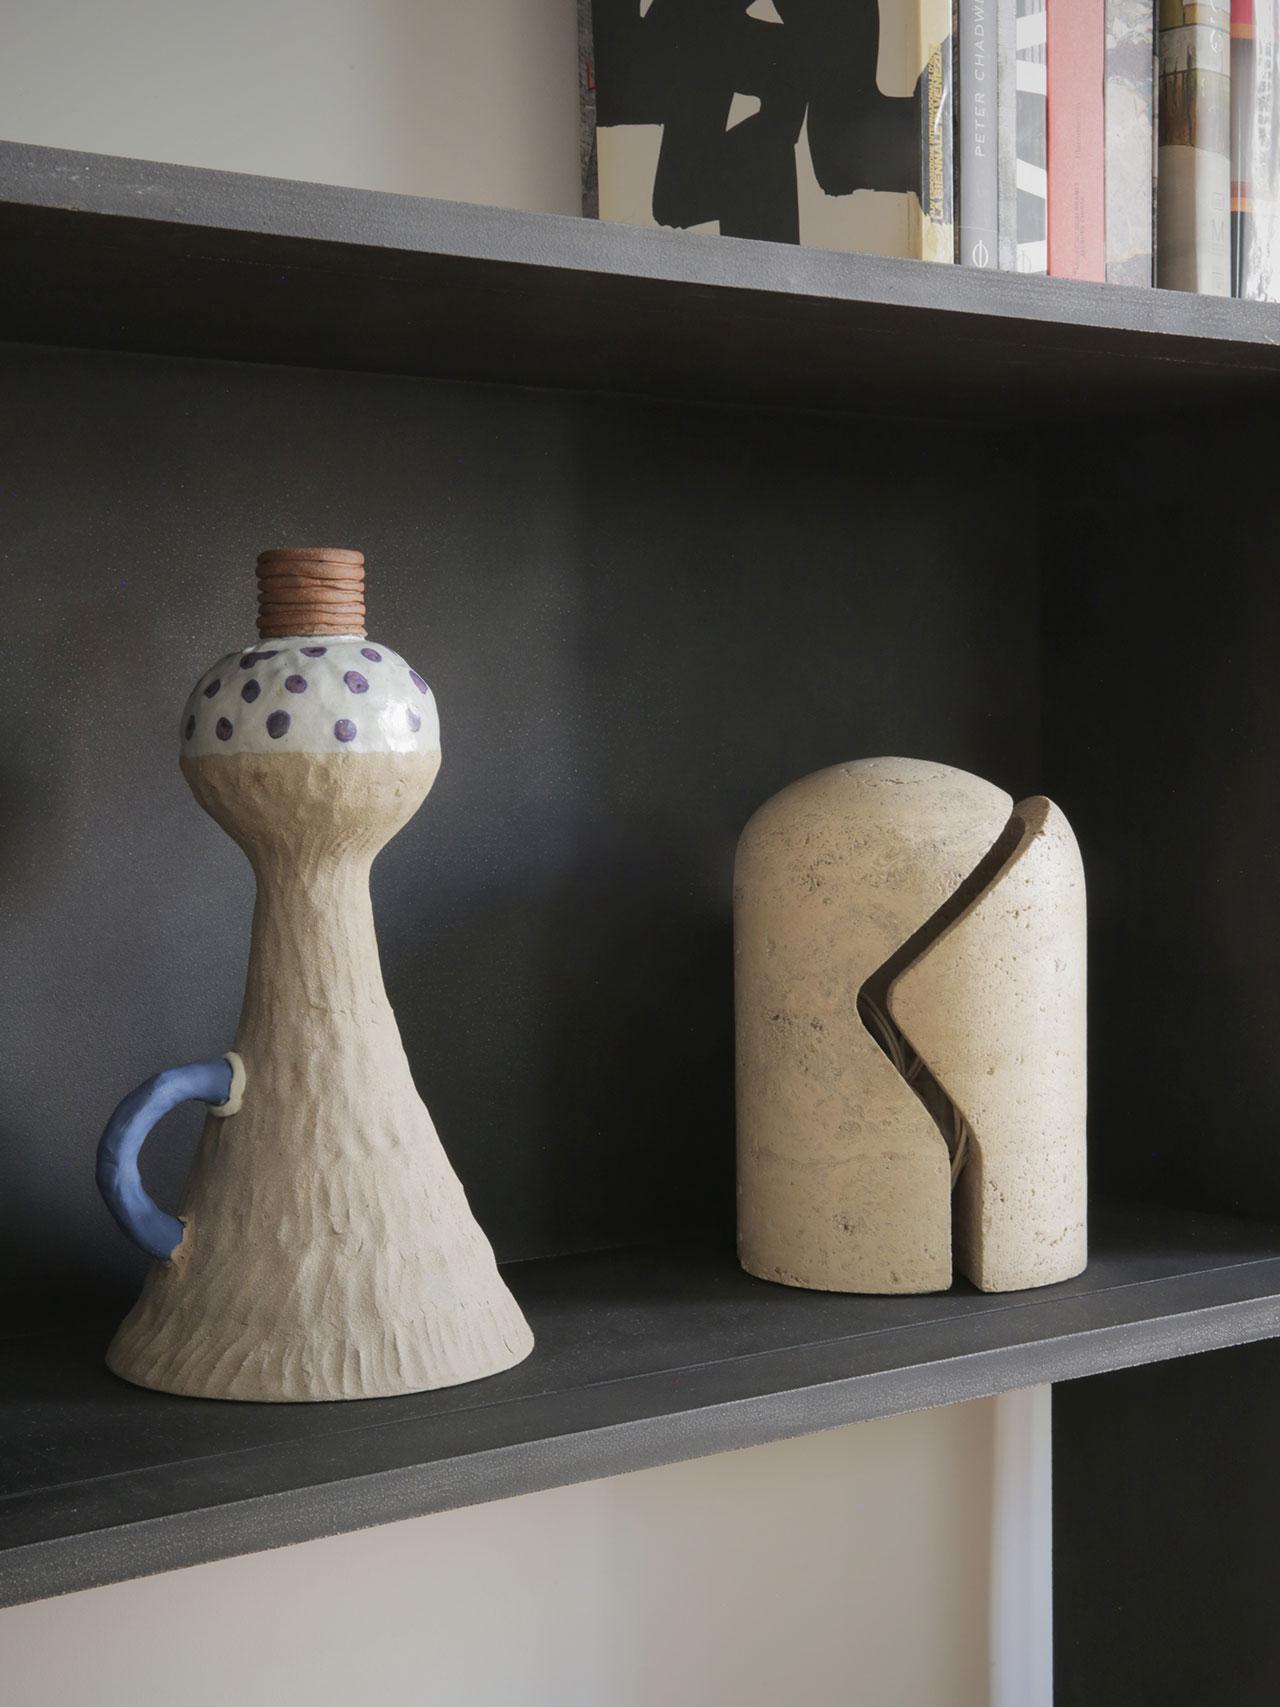 Ceramics by Quentin Marais, 2018-2019. Photography by Damien de Medeiros.